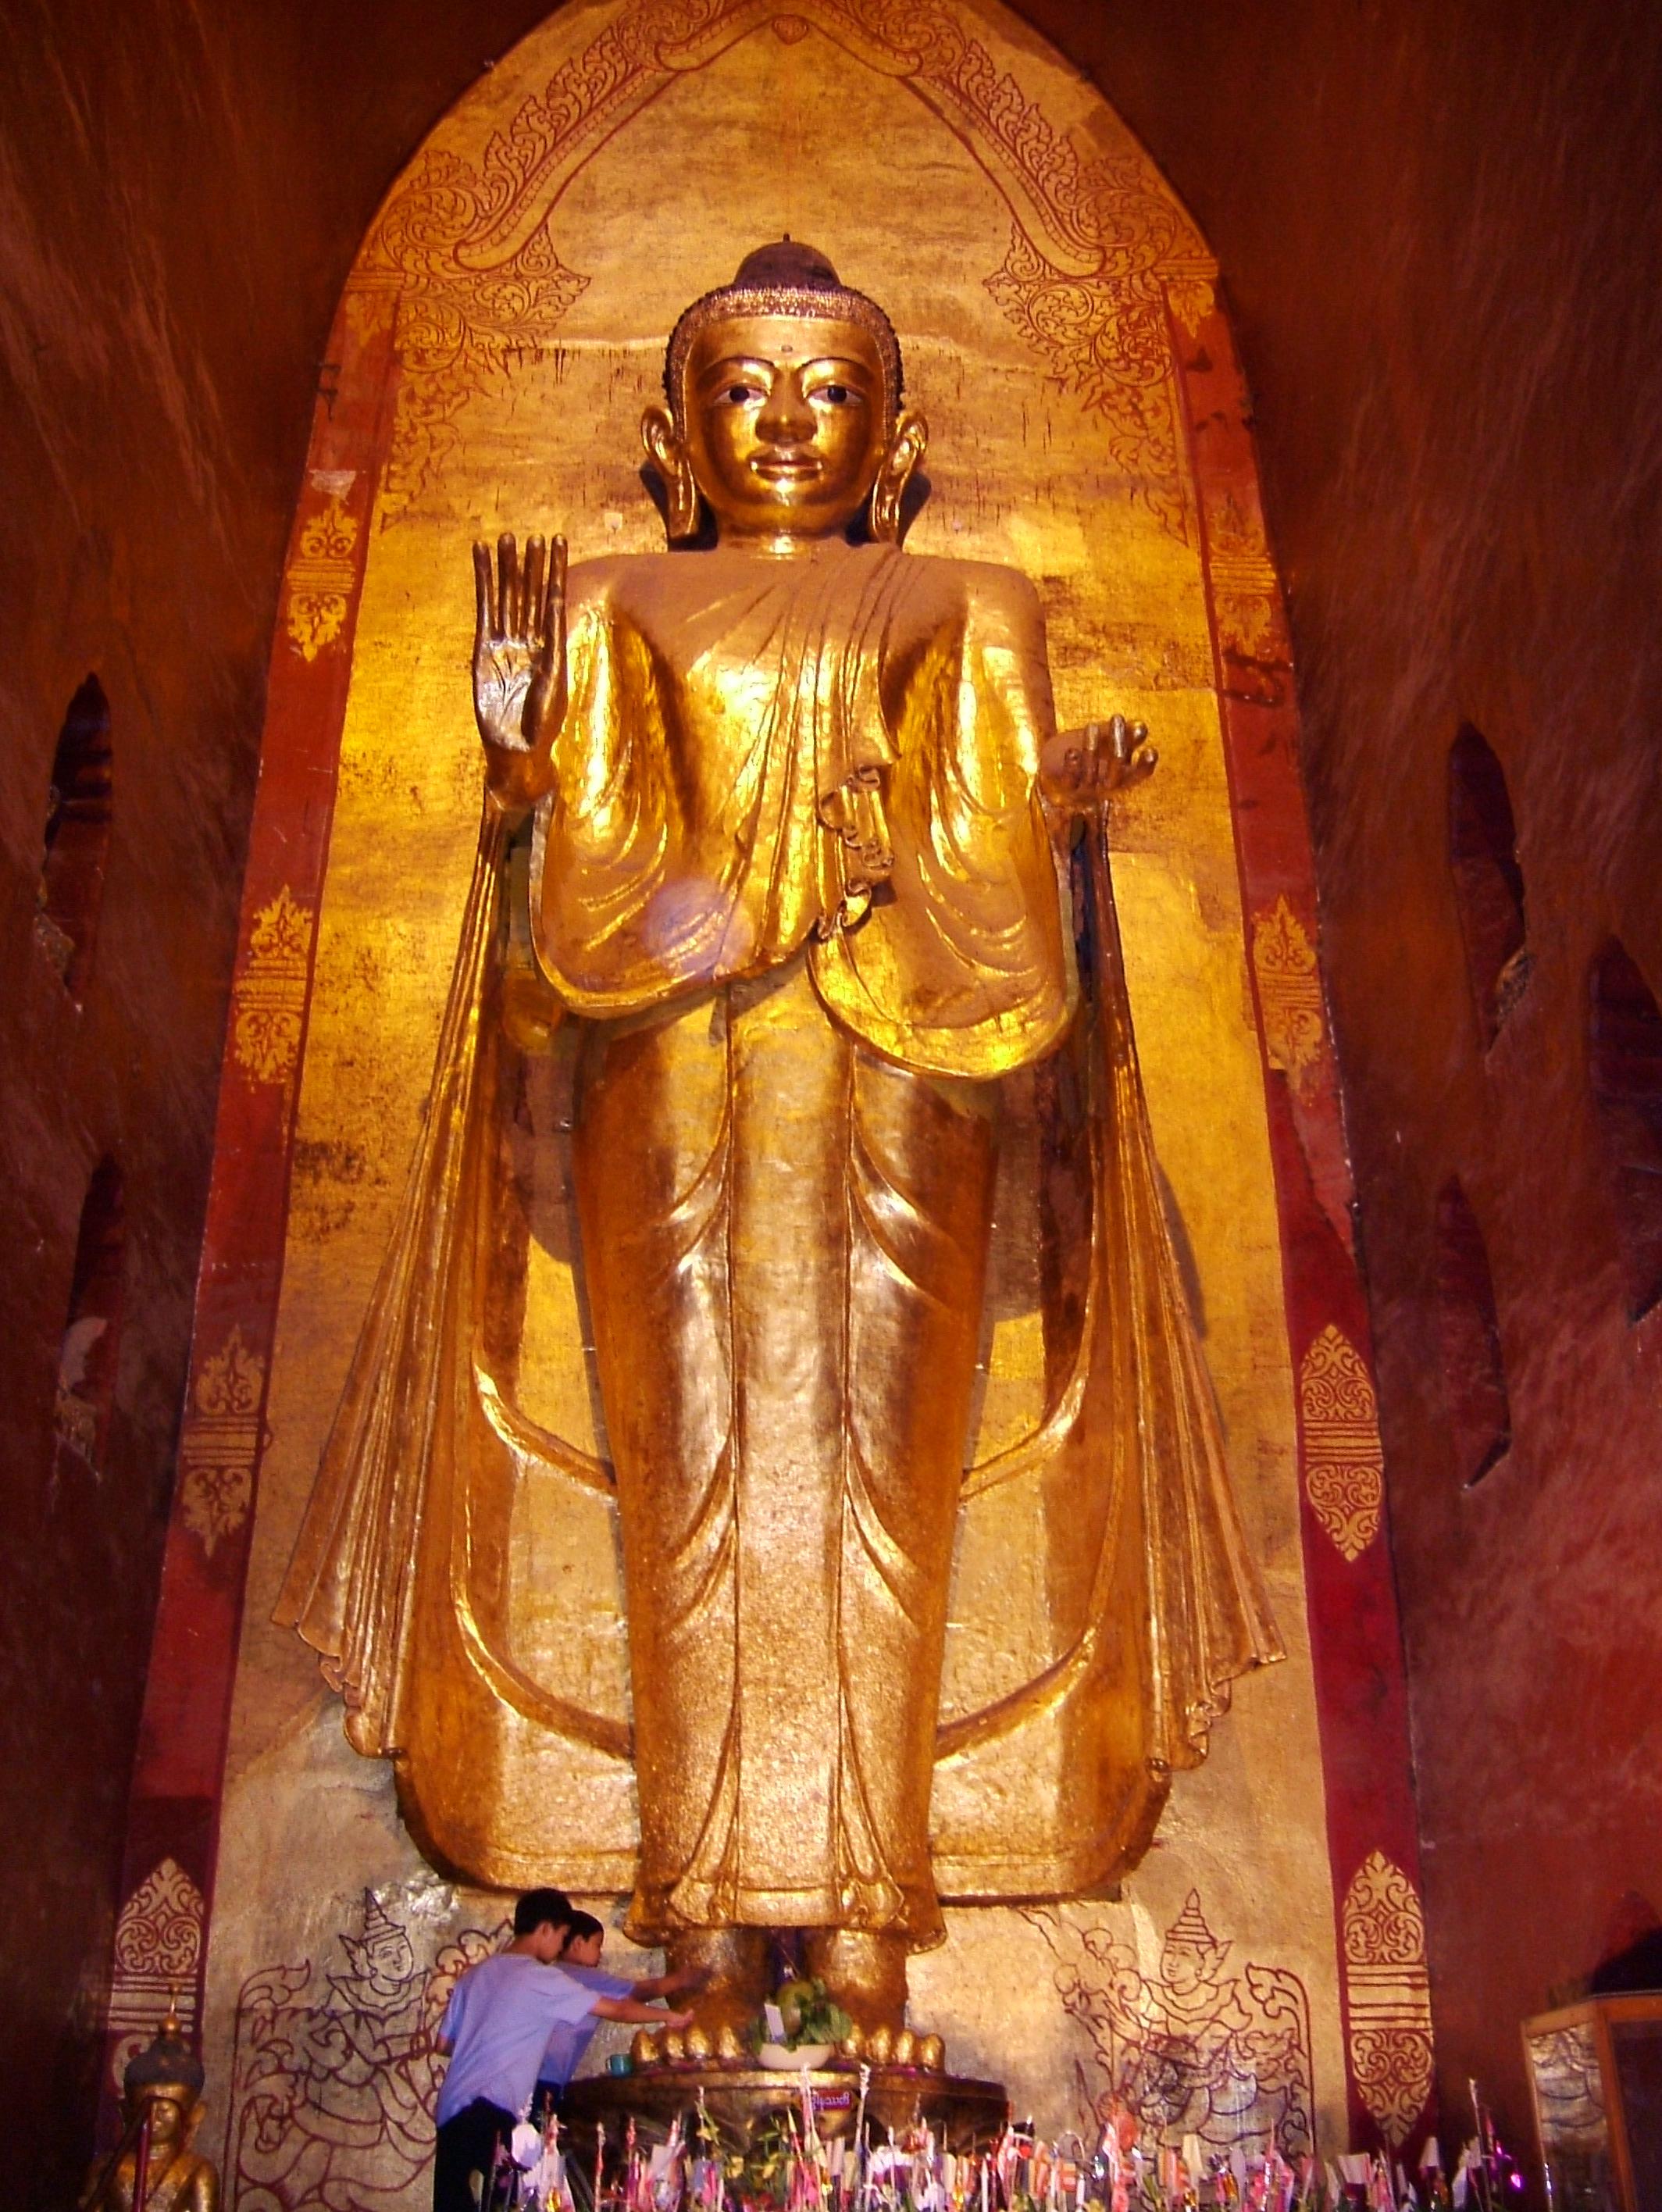 Ananda Pagoda standing Buddhas Pagan Dec 2000 17